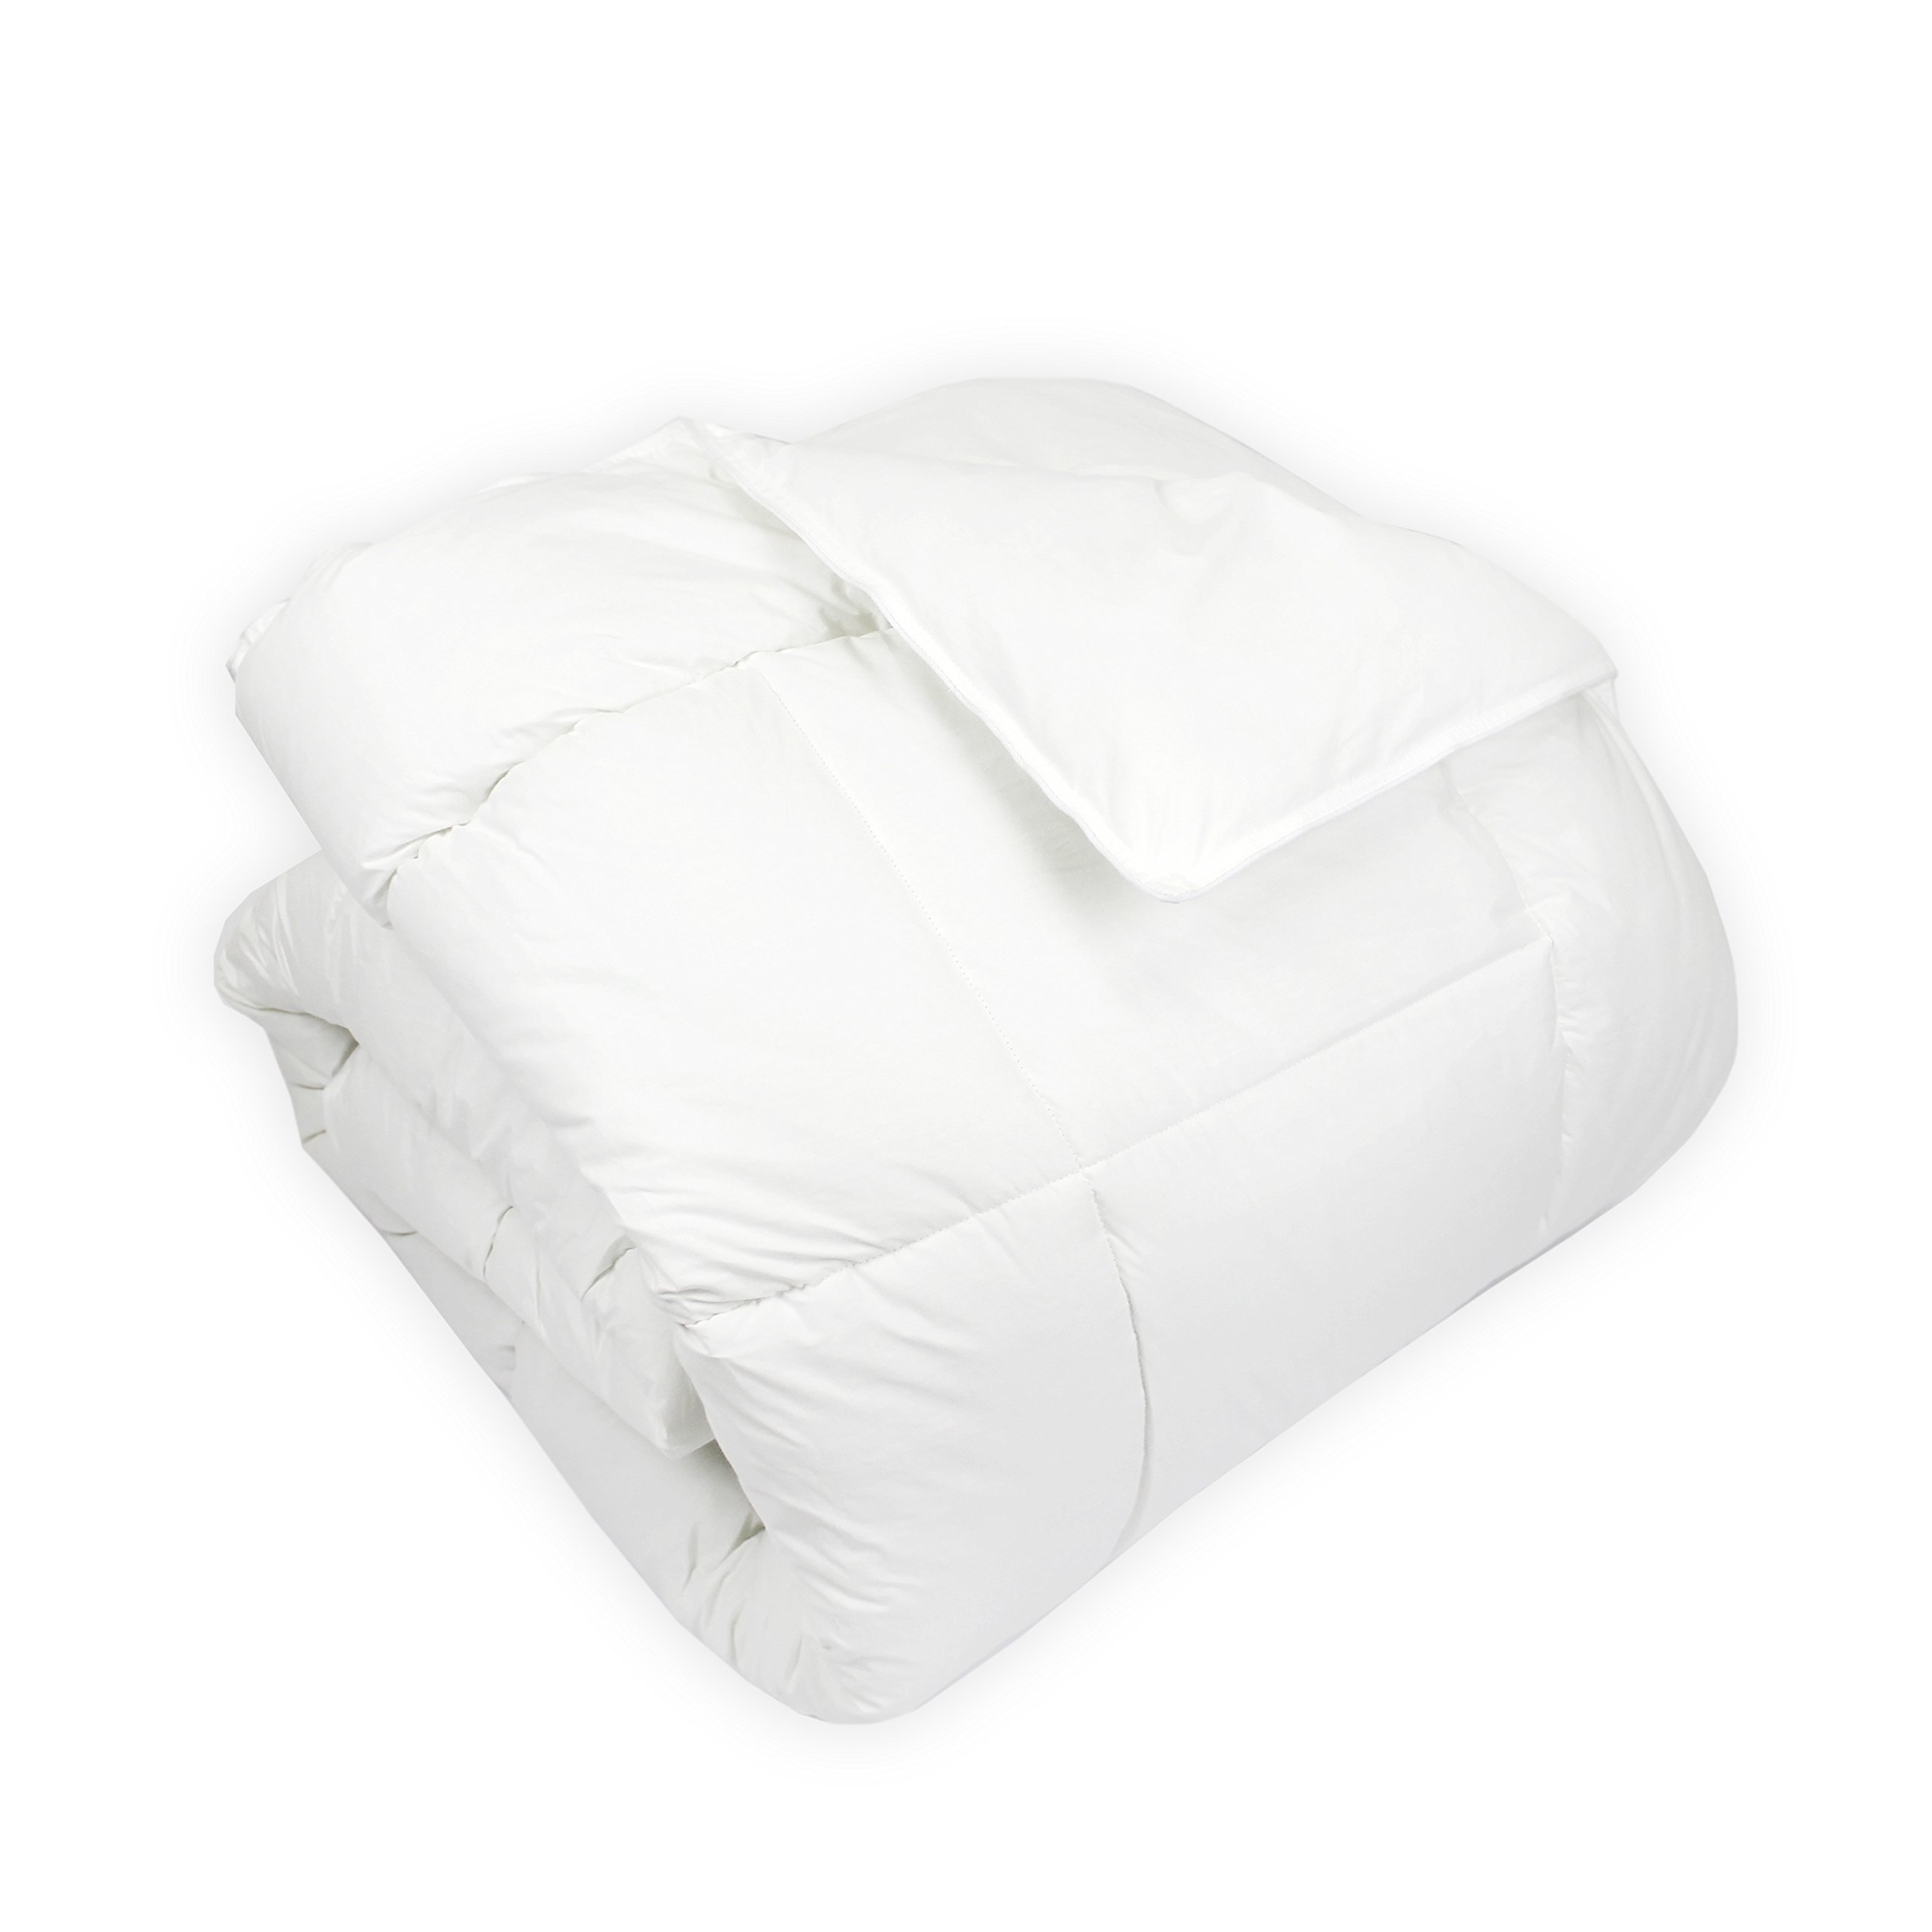 Century Home C402-103 Hotel Collection Premium Comforter, Queen